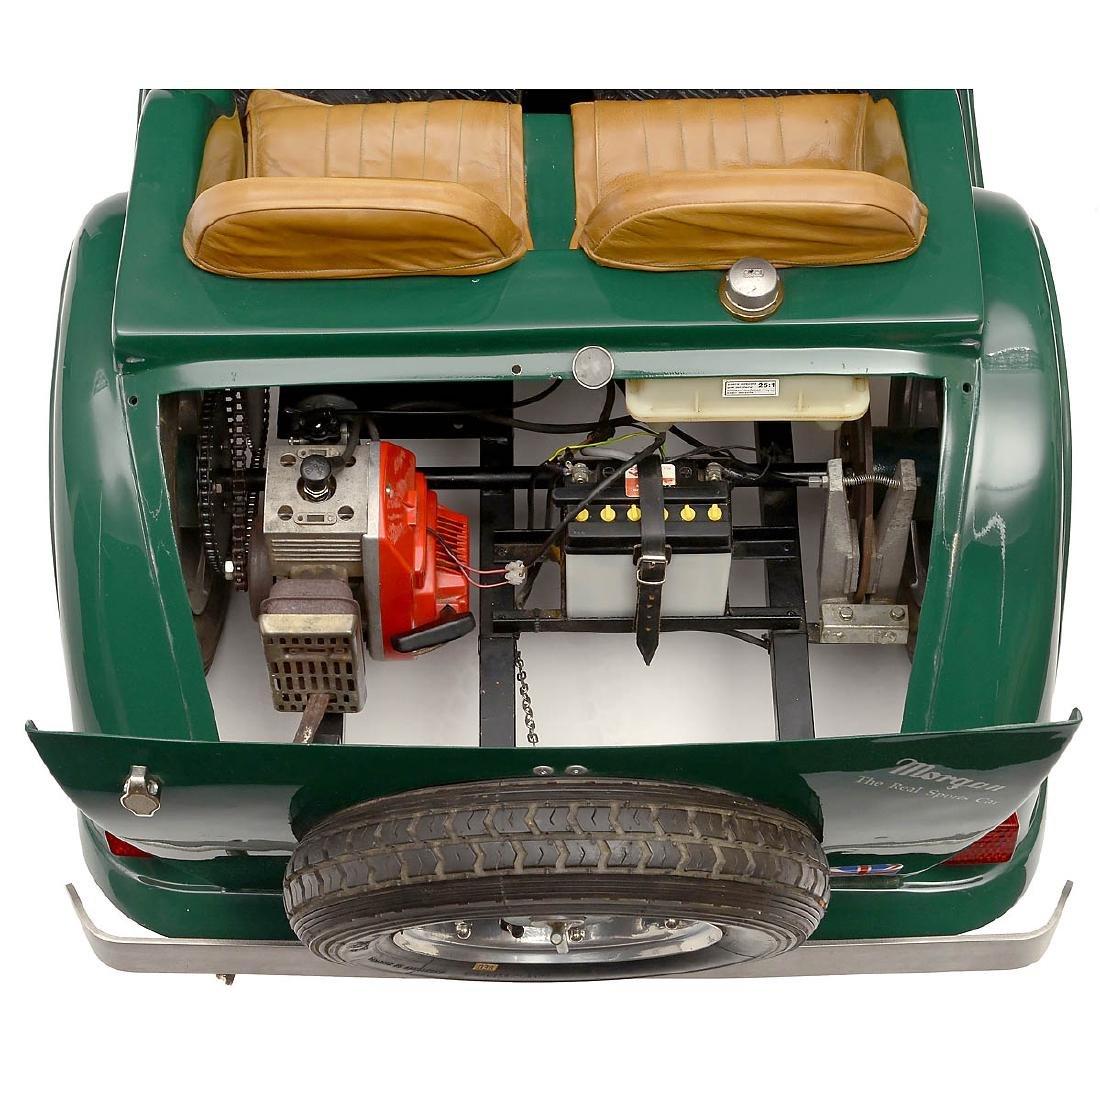 Morgan Plus 8 1:2 Scale Child's Car - 3